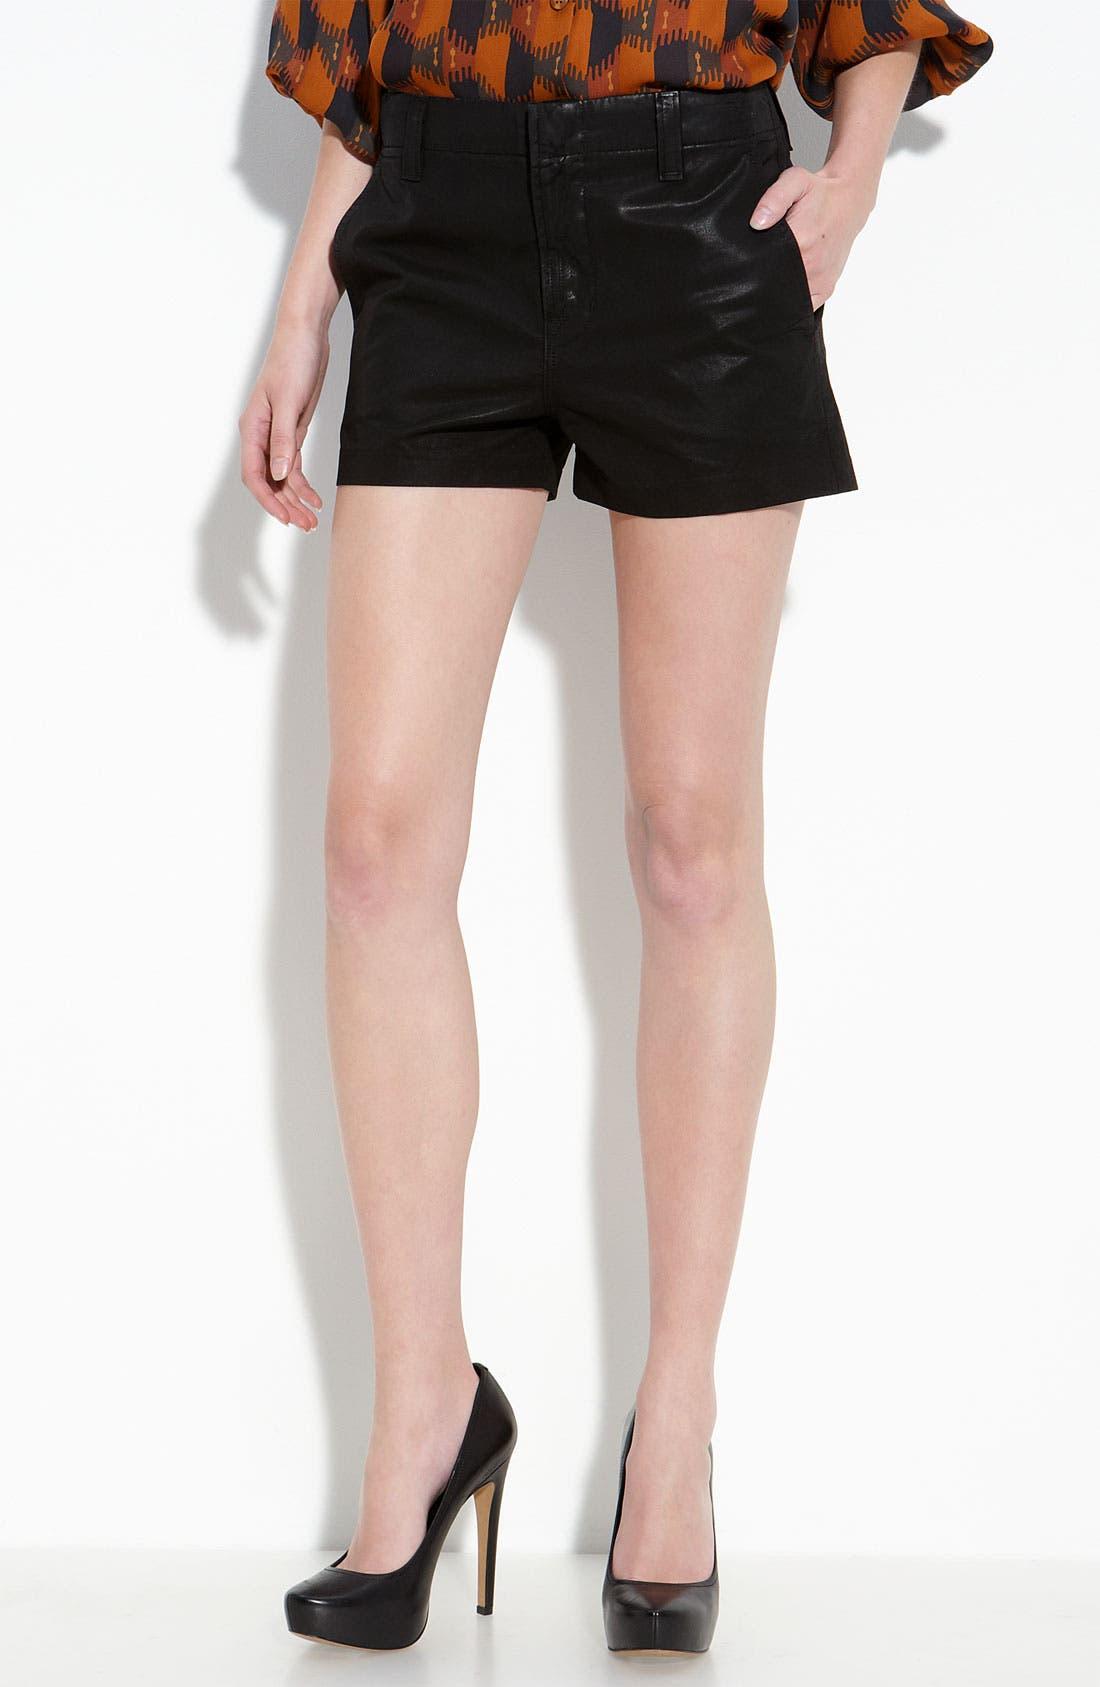 Alternate Image 1 Selected - J Brand 'Lola' High Rise Wax Coated Denim Shorts